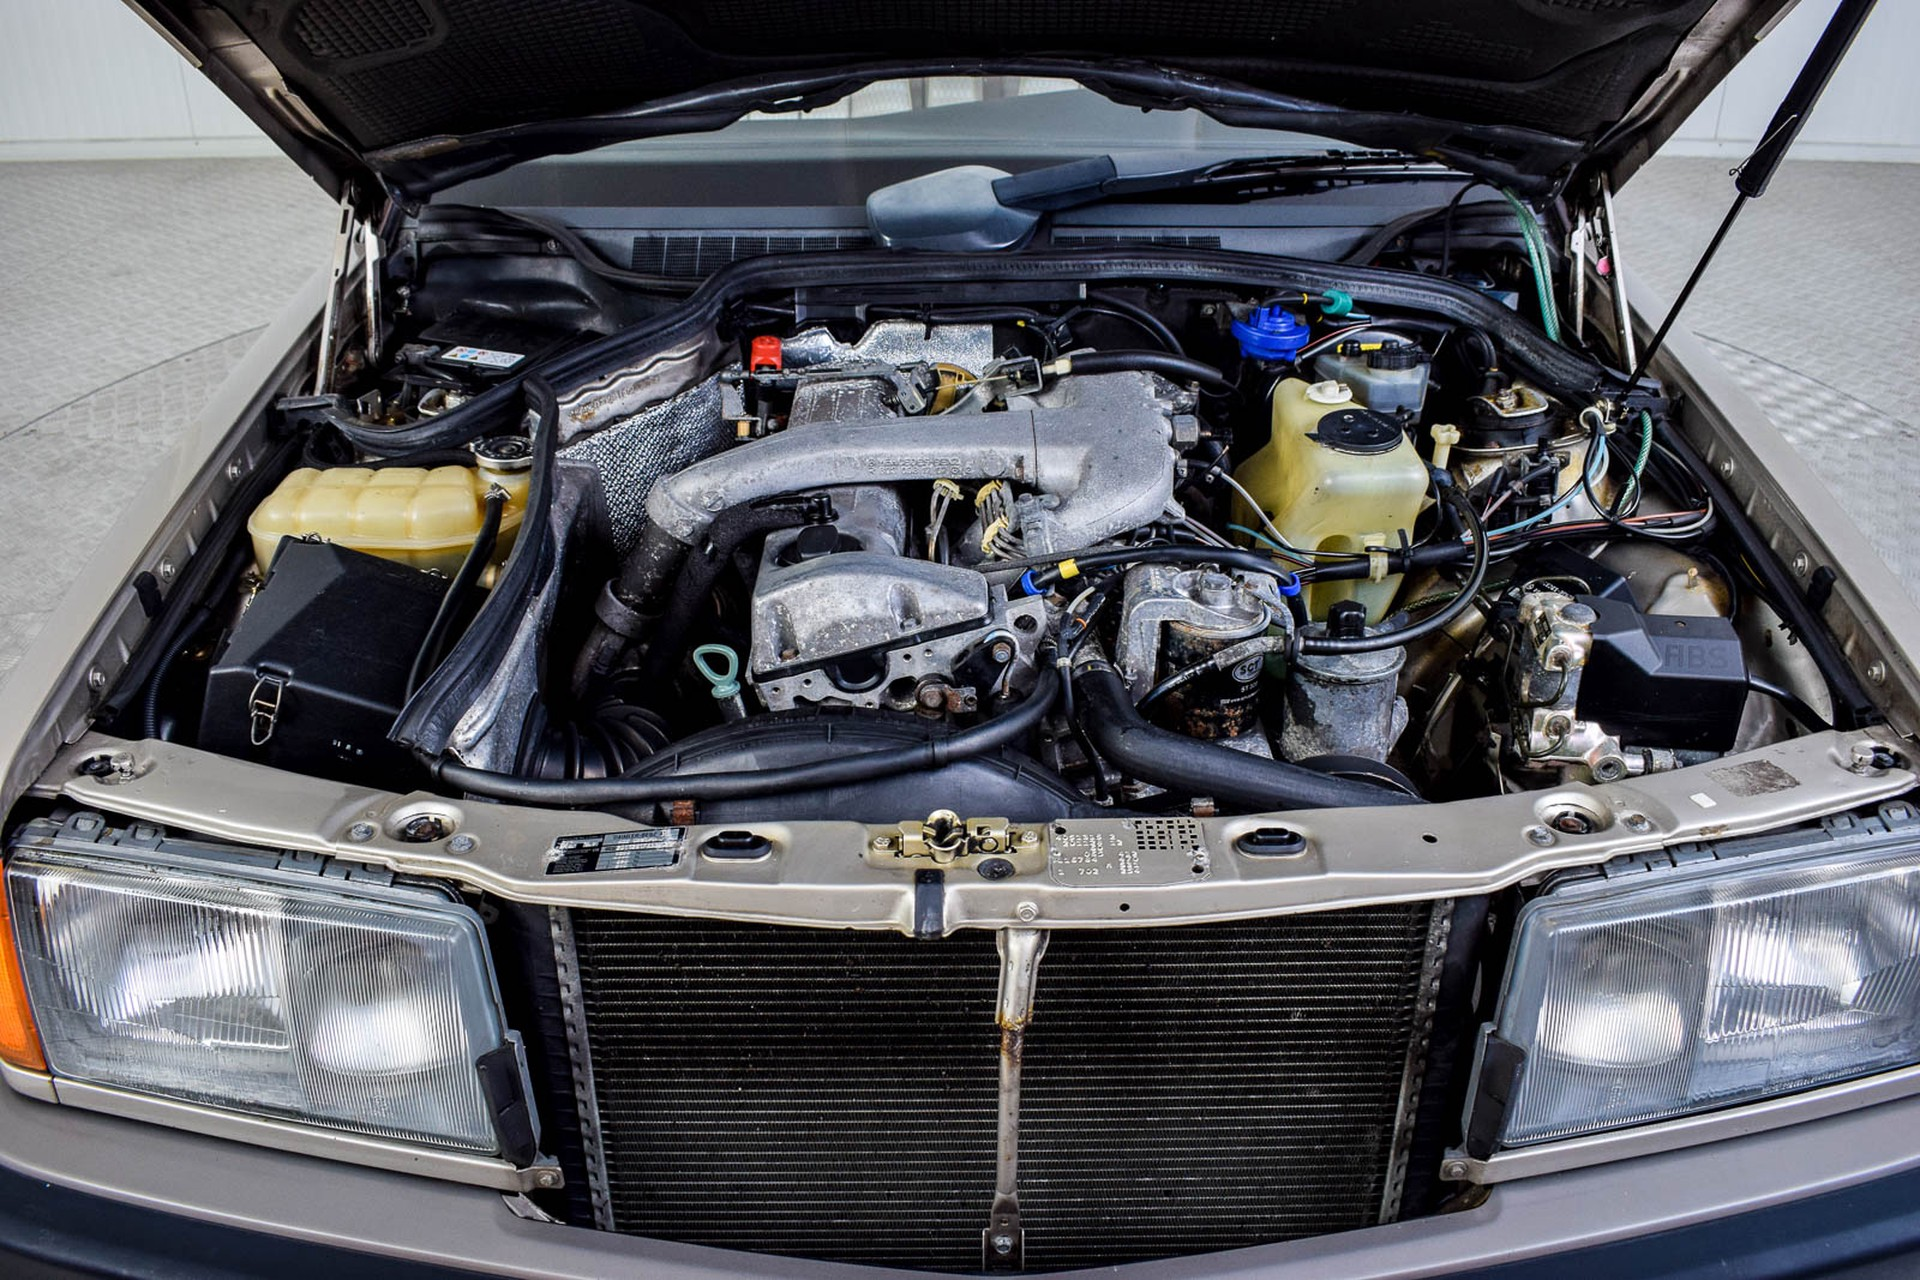 Mercedes-Benz 190 2.5 D Turbo Diesel Foto 29